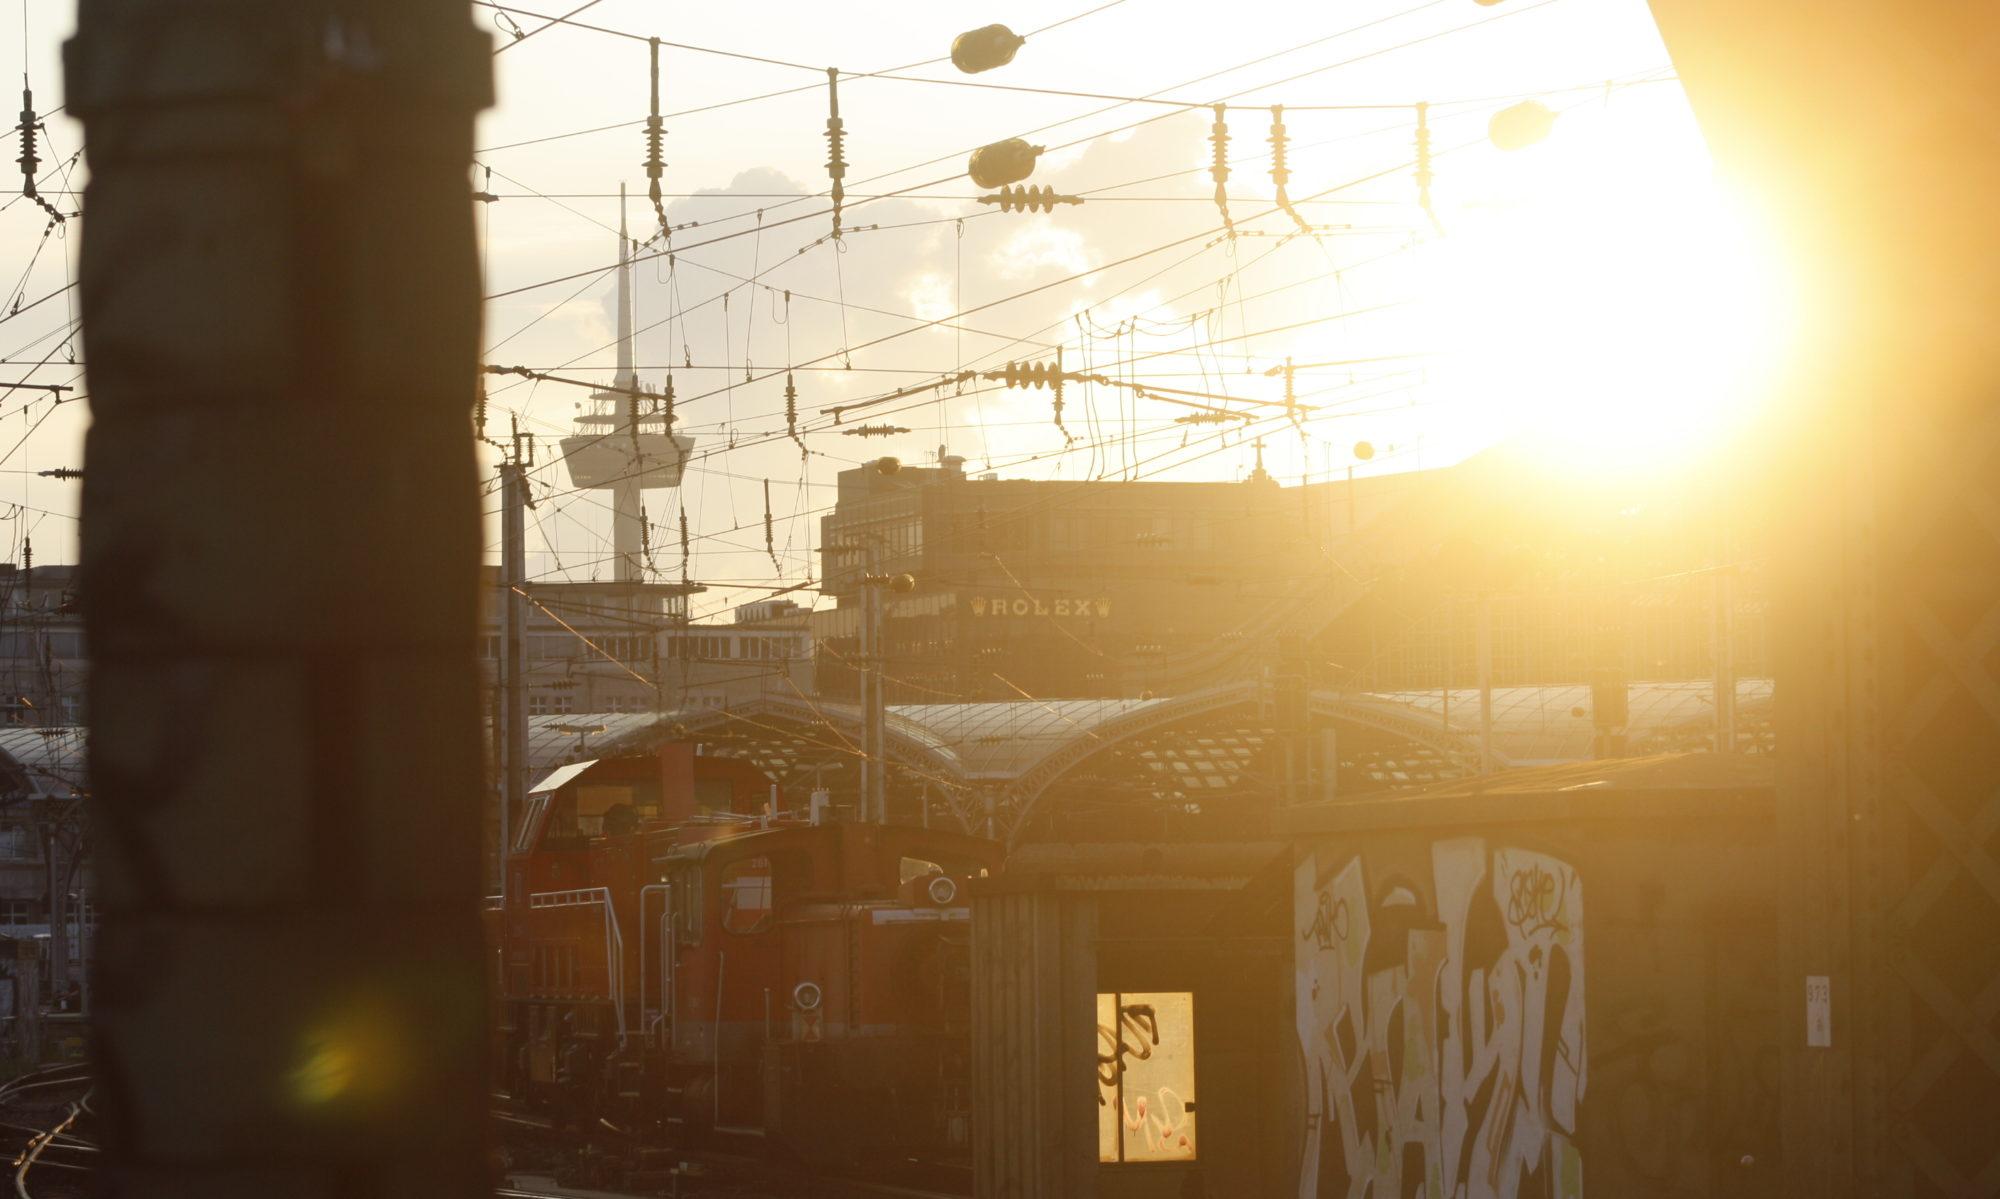 Philipps Eisenbahnblog